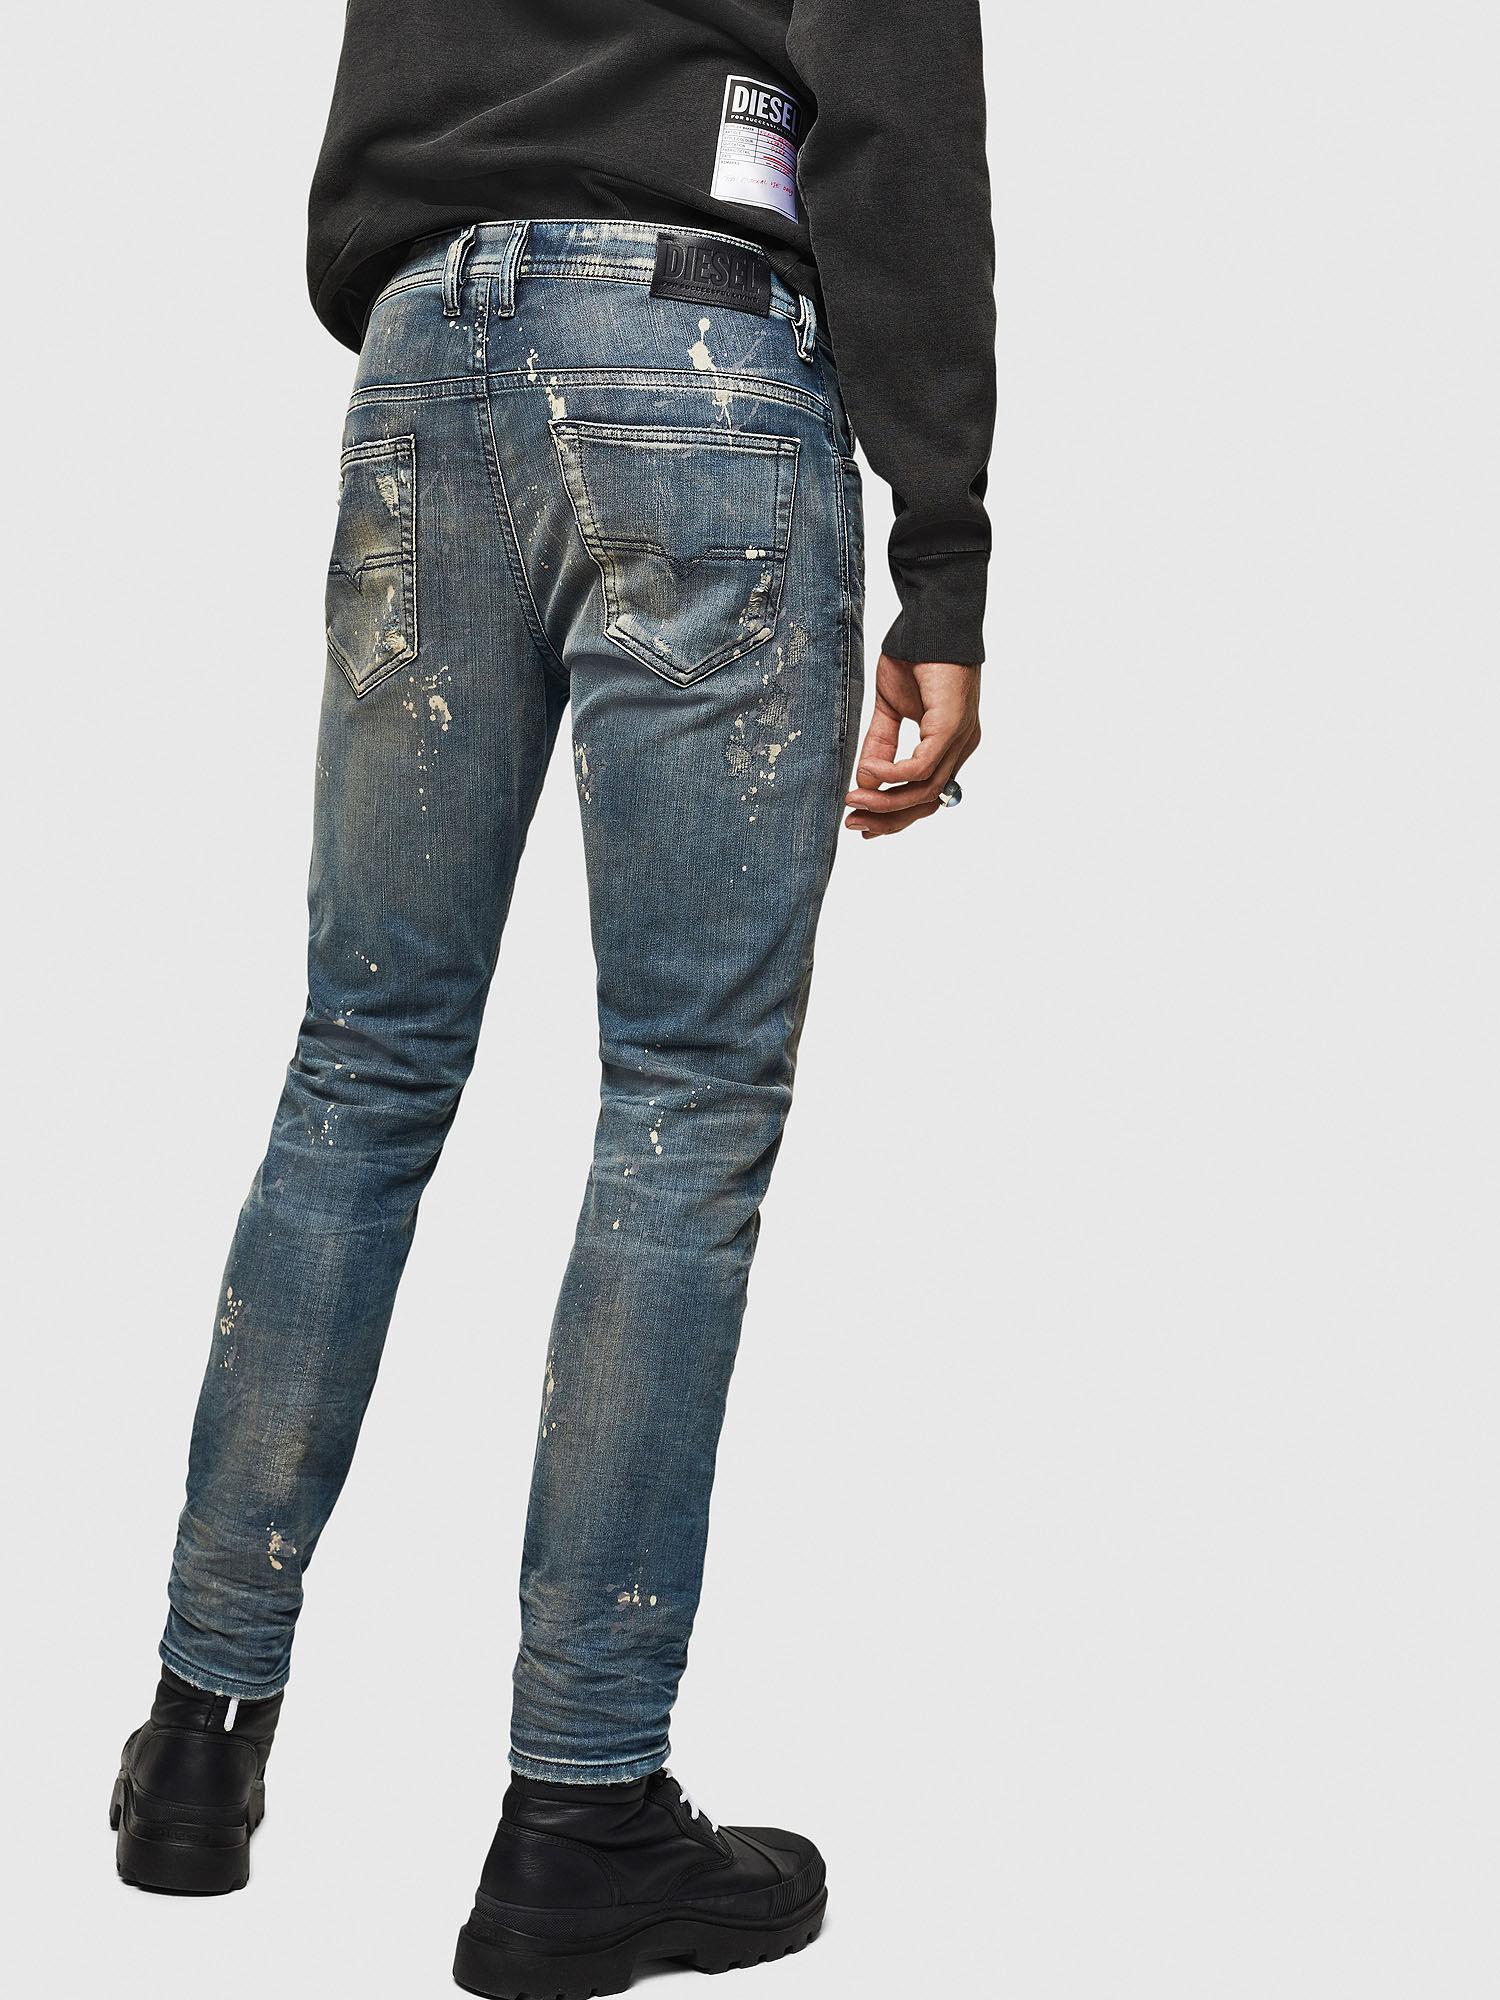 Diesel Thommer Mid Stone Wash Slim Fit Jeans